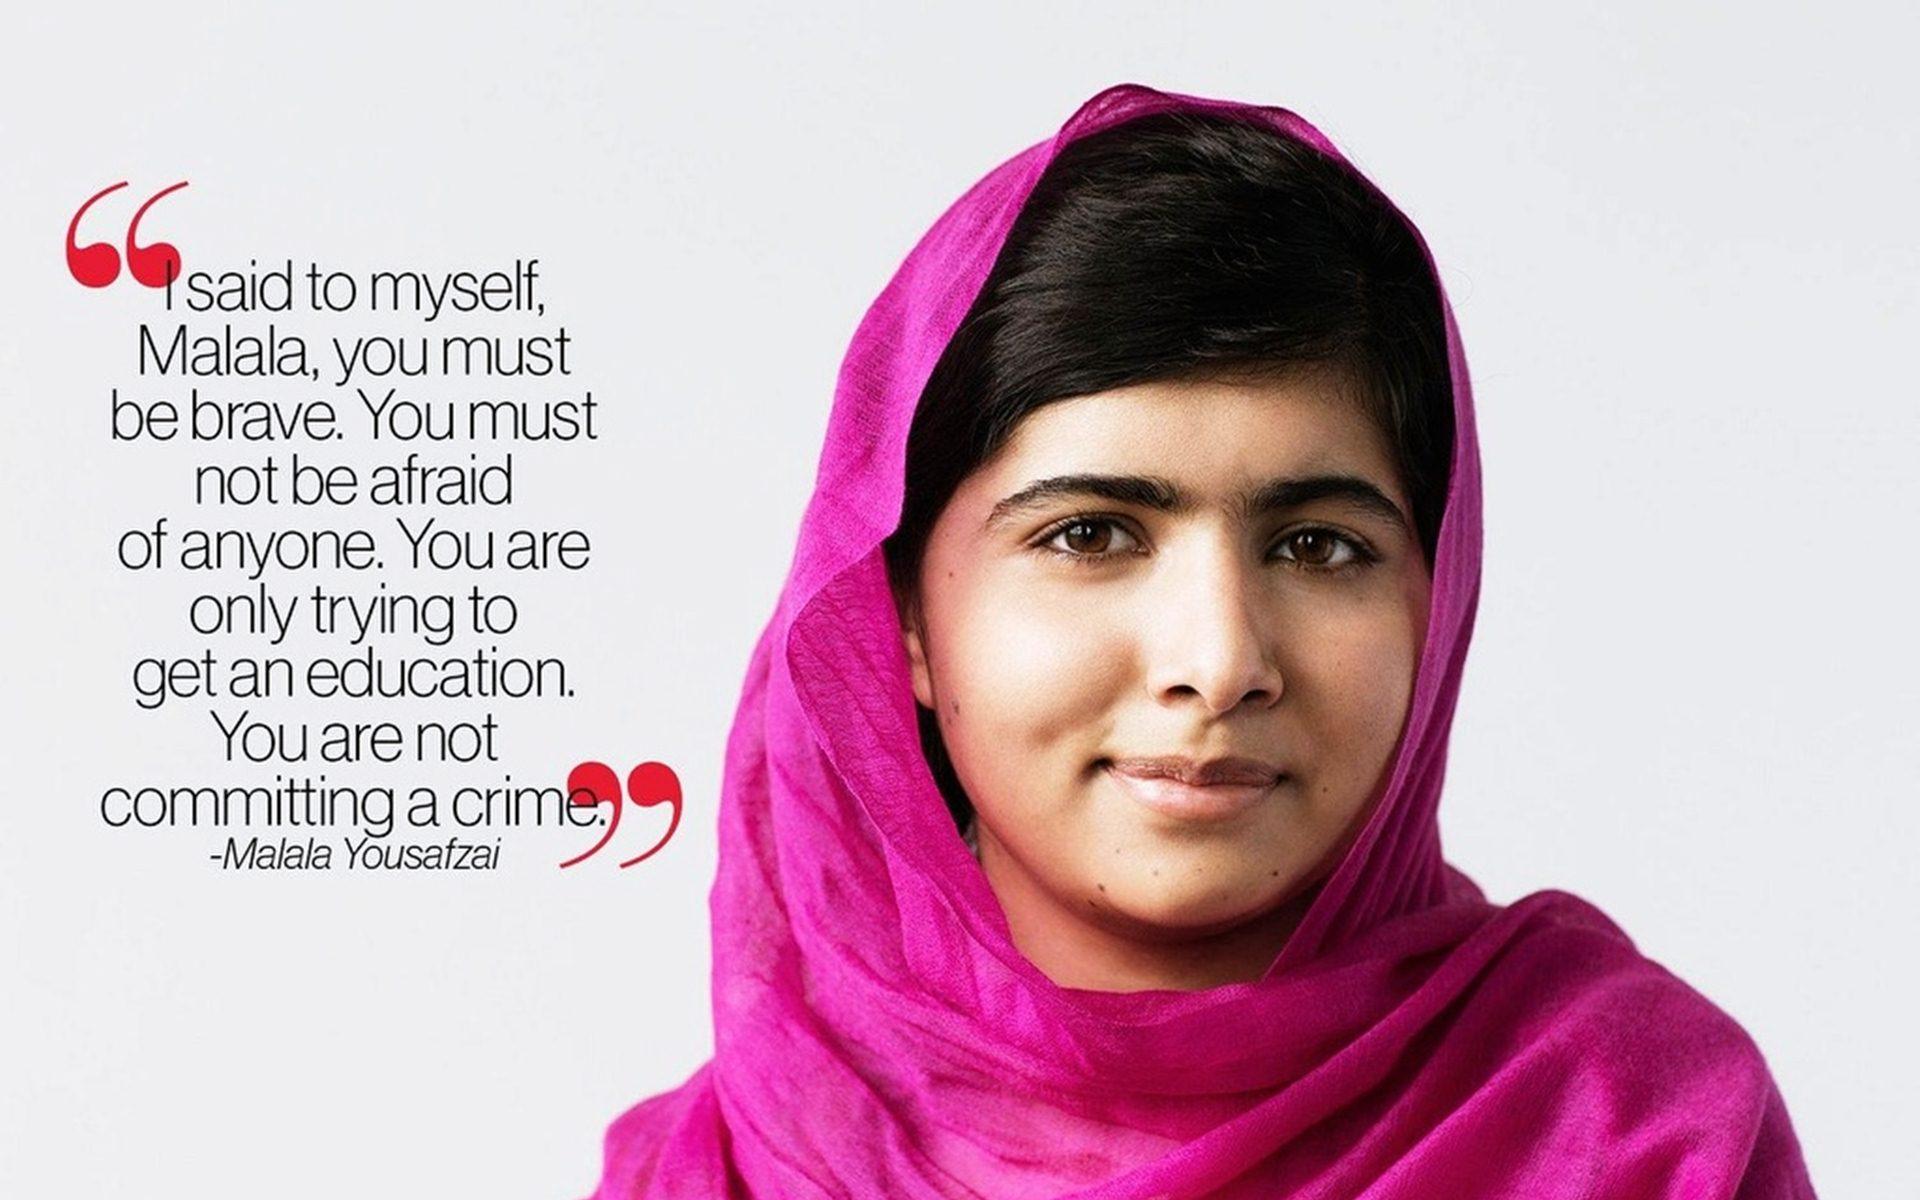 Malala Yousafzai Wallpaper 6   1920 X 1200 stmednet 1920x1200